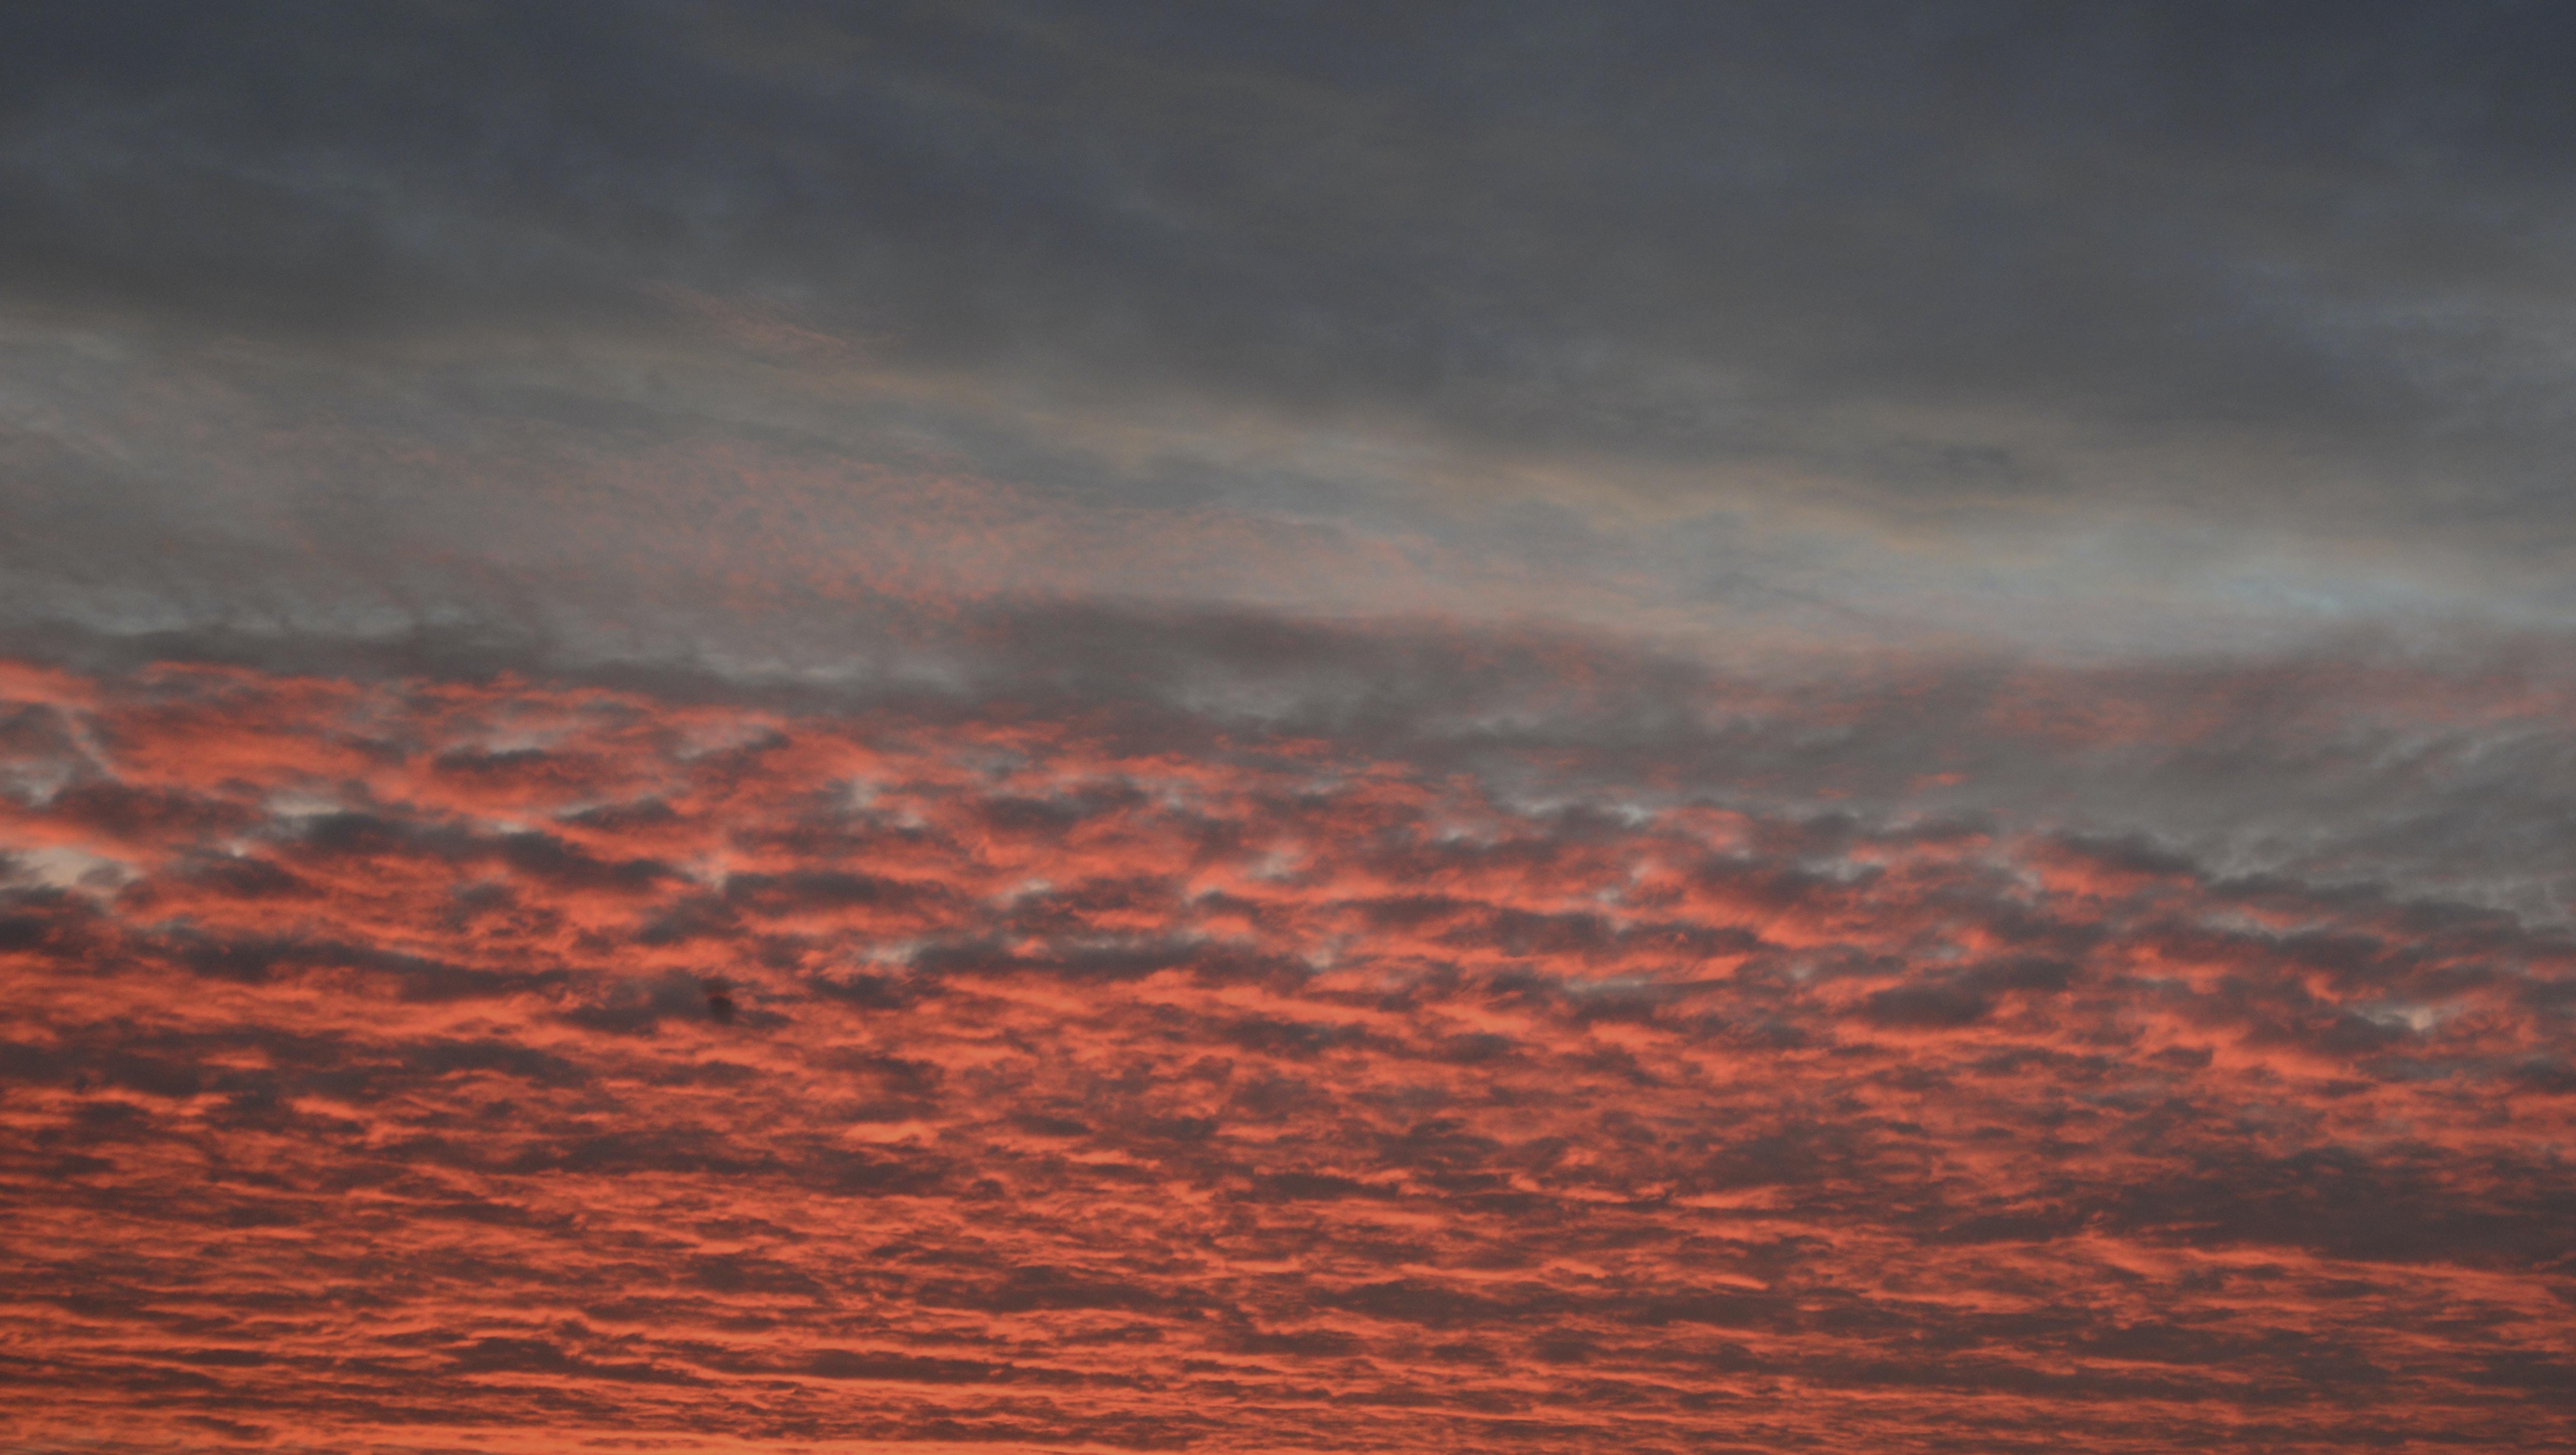 bird's eye view photo of red skies